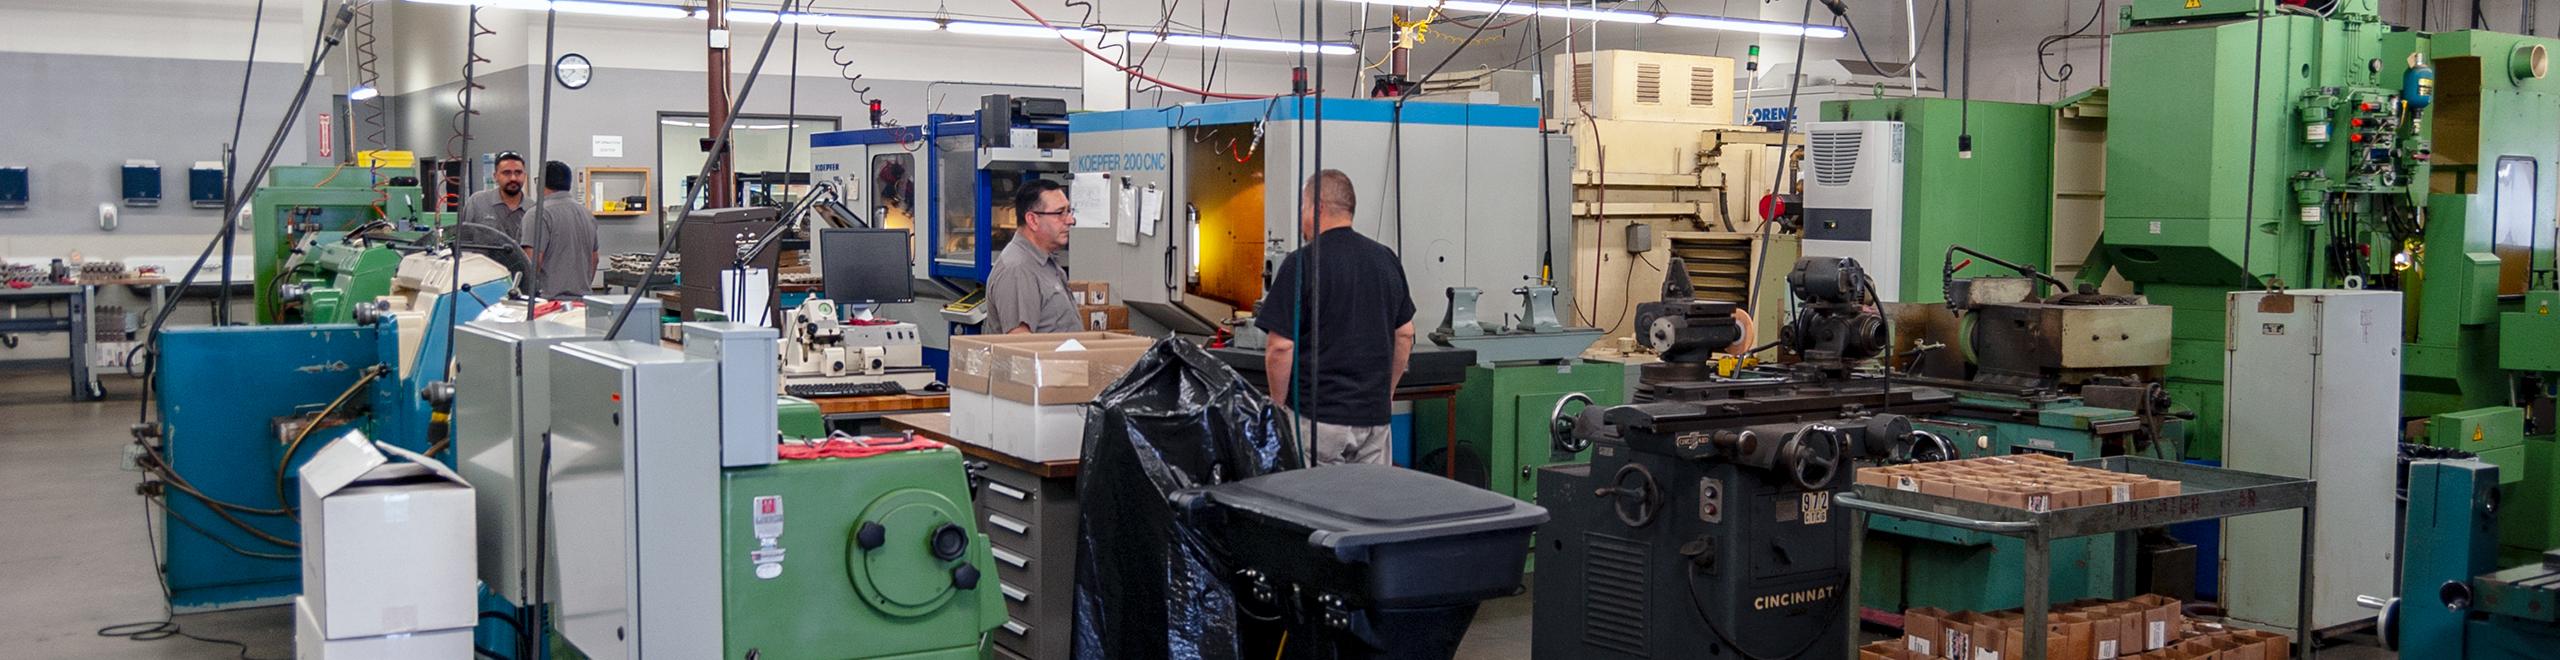 premier gear shop floor